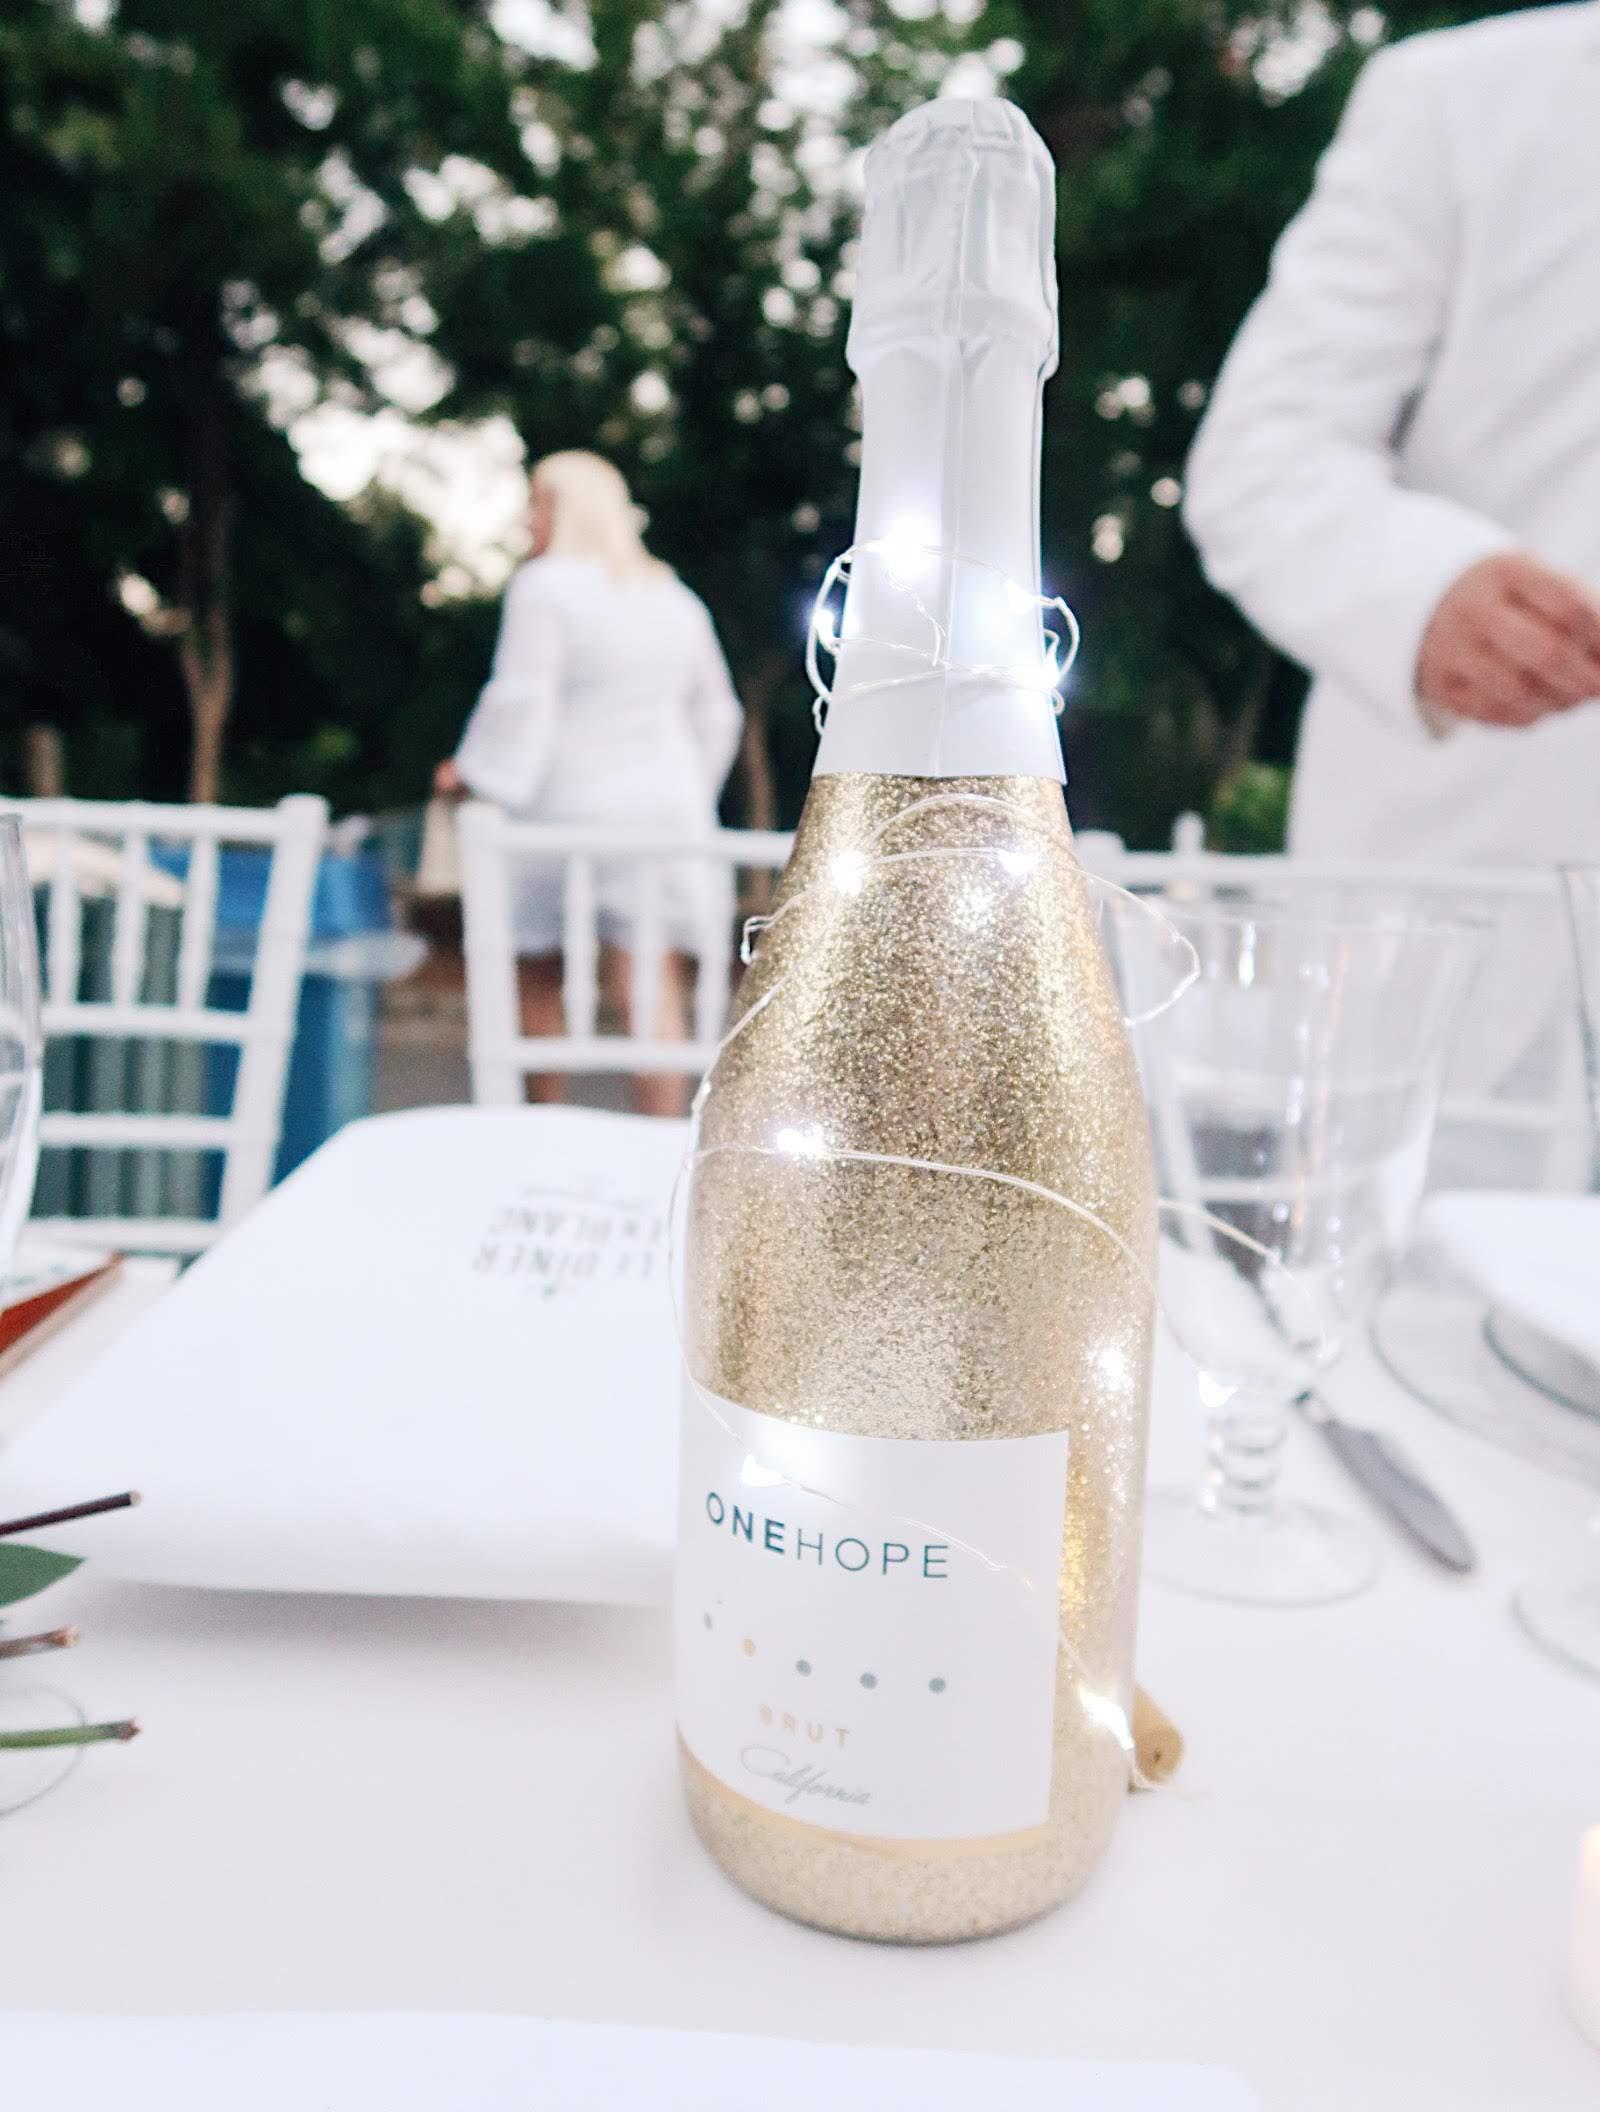 diner en blanc sacramento 2018 one hope wine tinted green 3